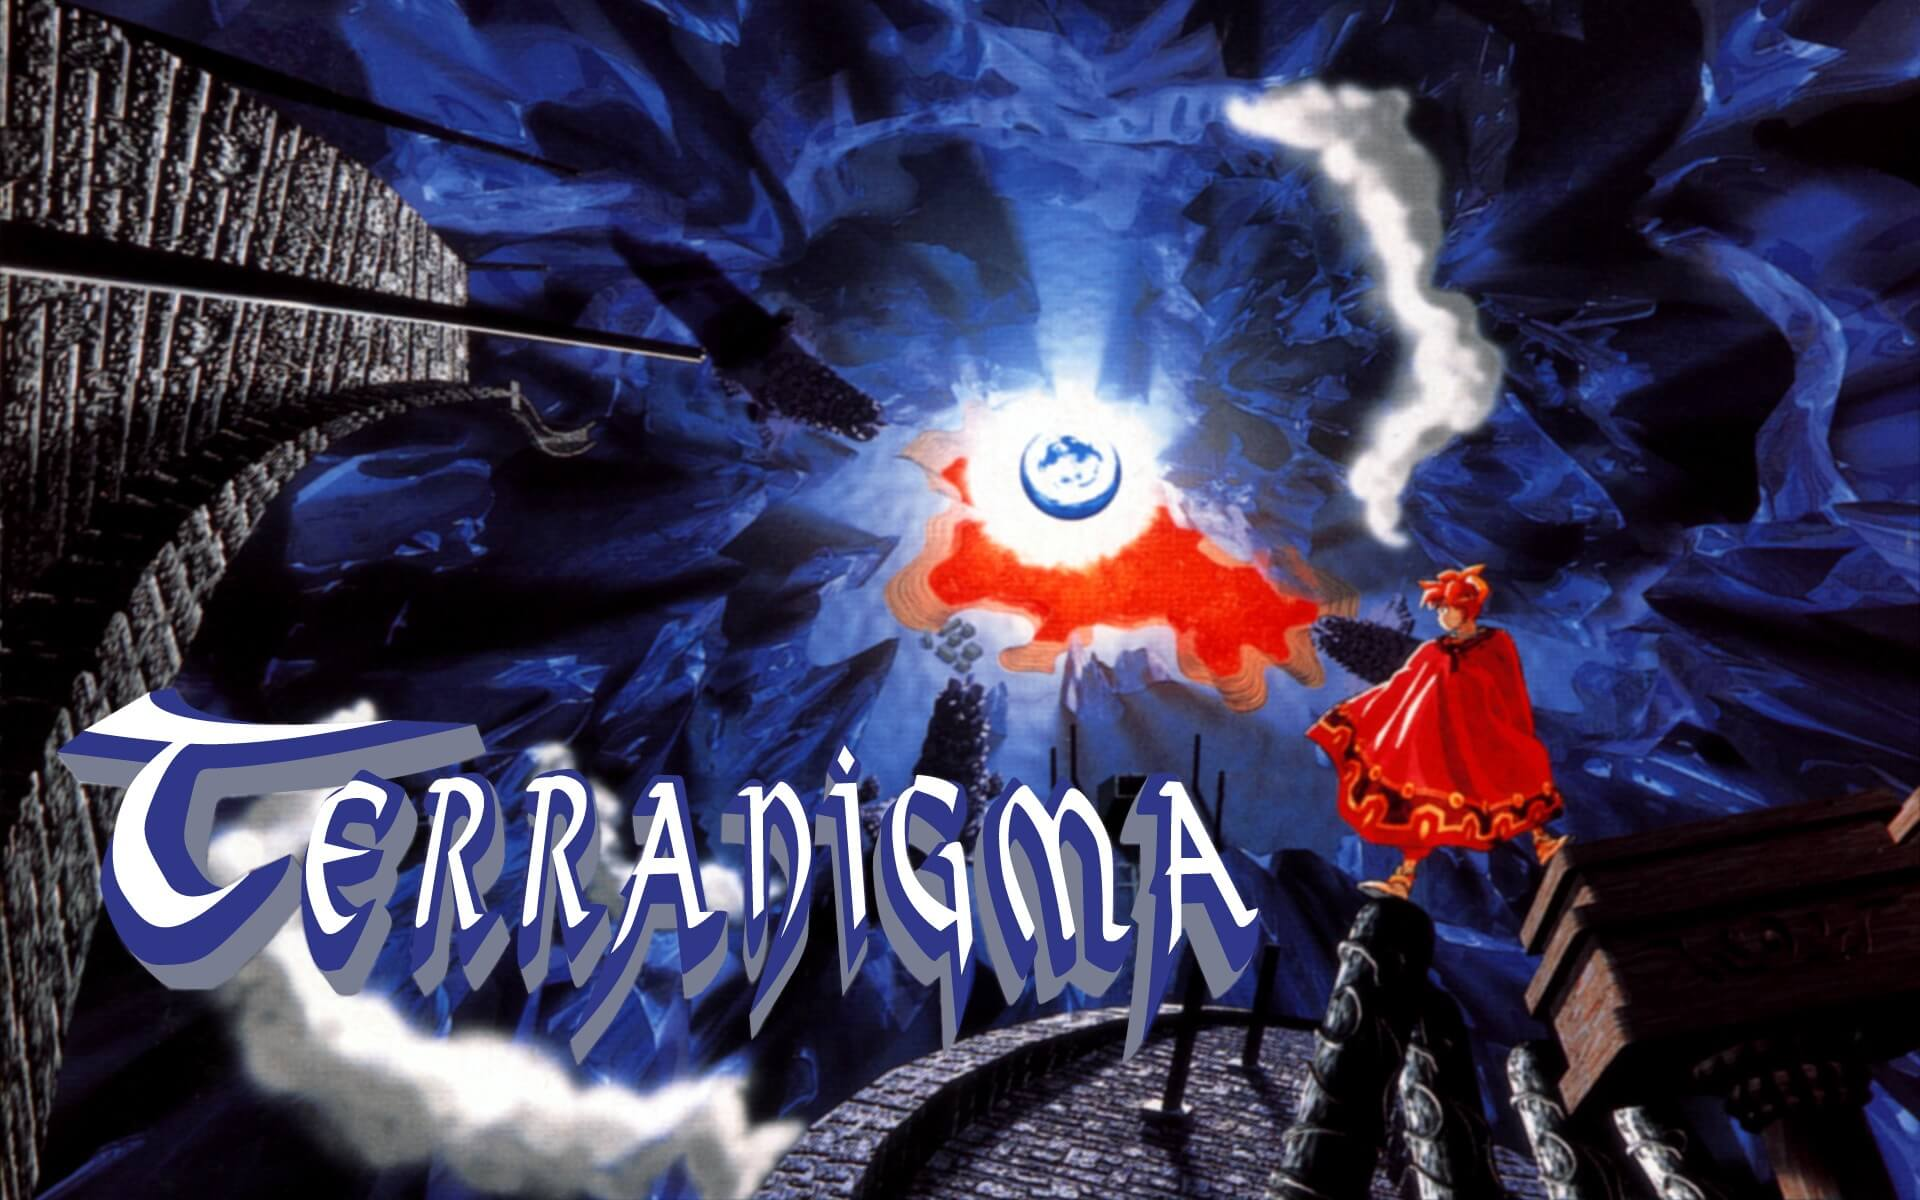 Terranigma: Ehemalige Entwickler wollen SNES-RPG wiederbeleben